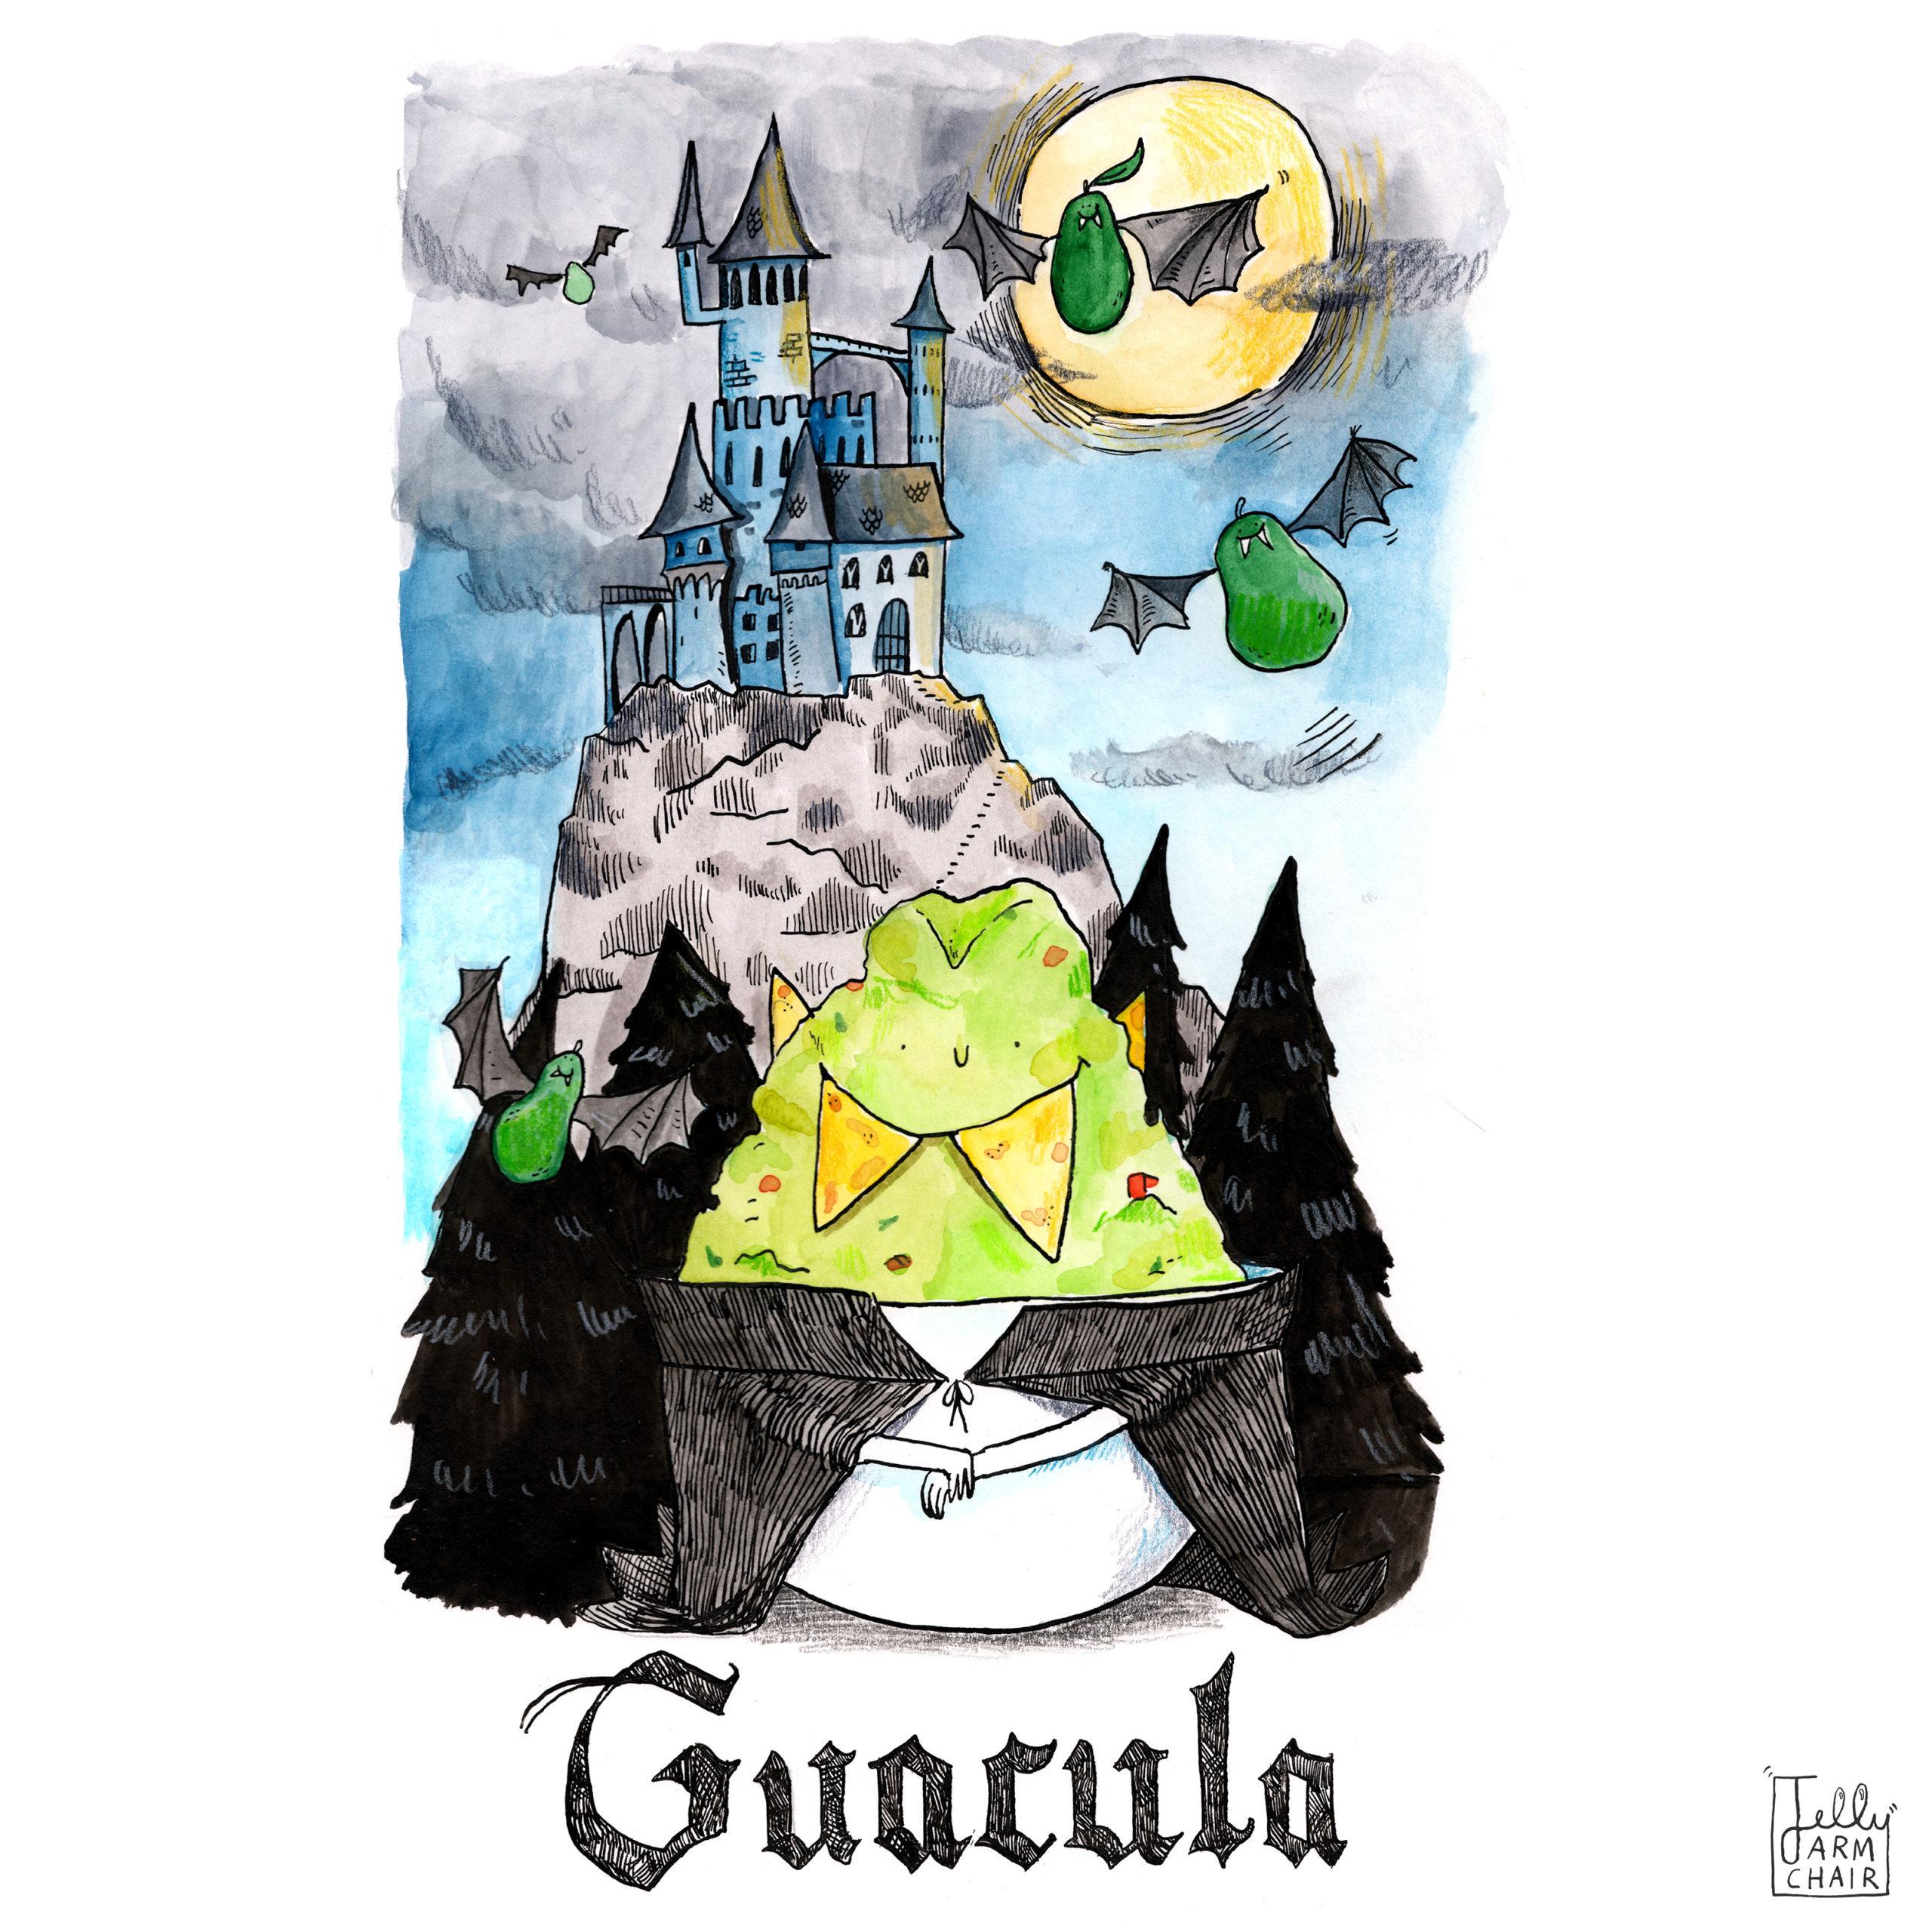 Guacula-Book-scaled